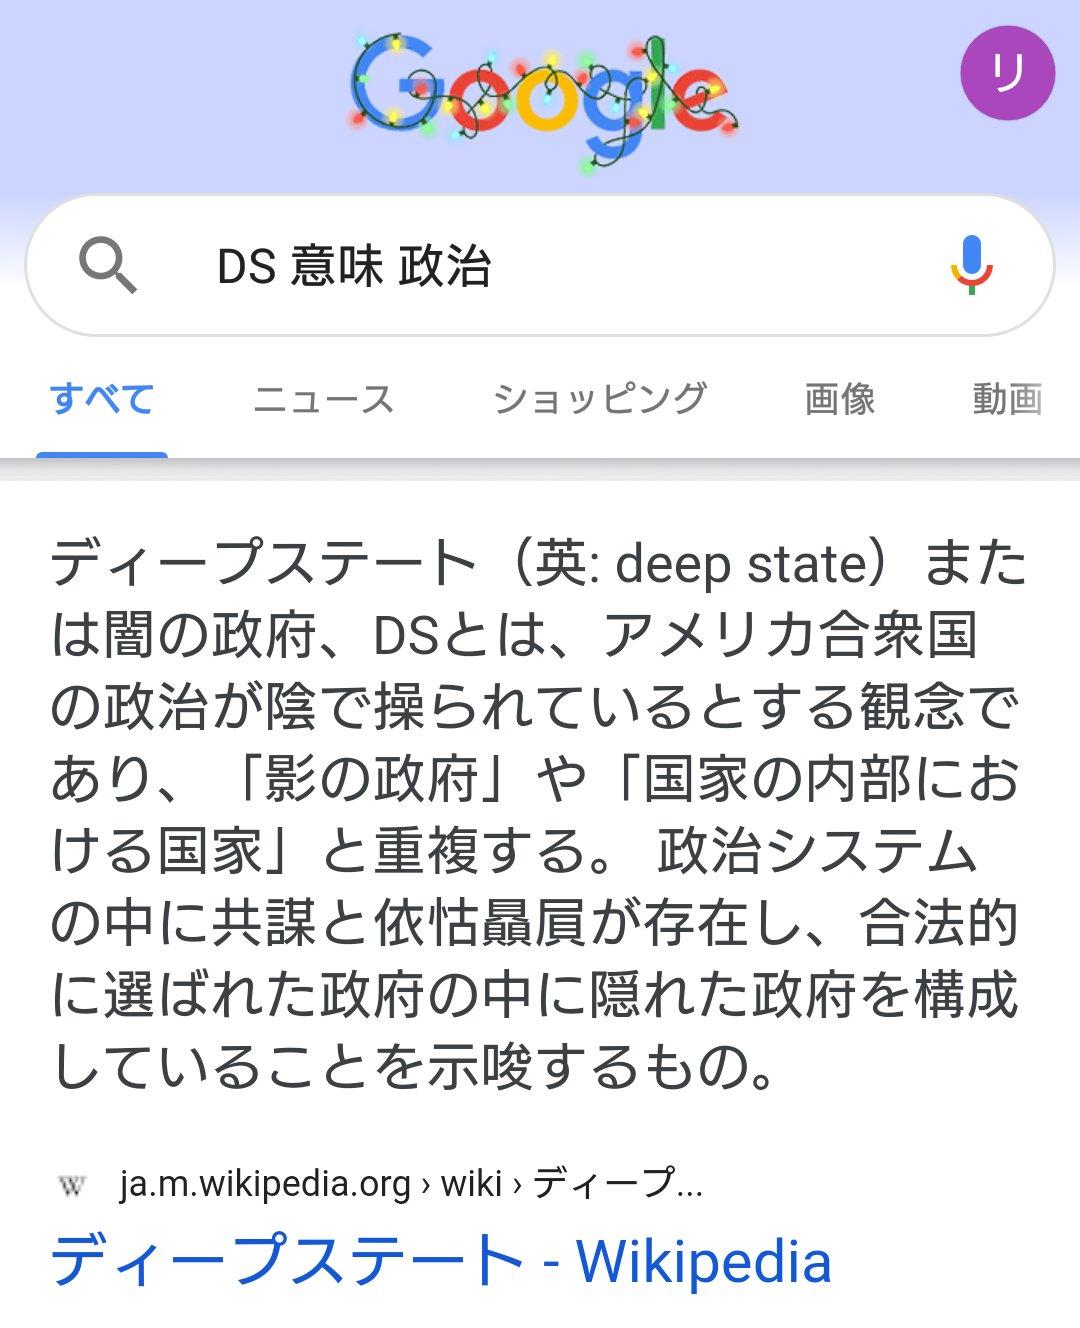 Wiki ディープ ステート